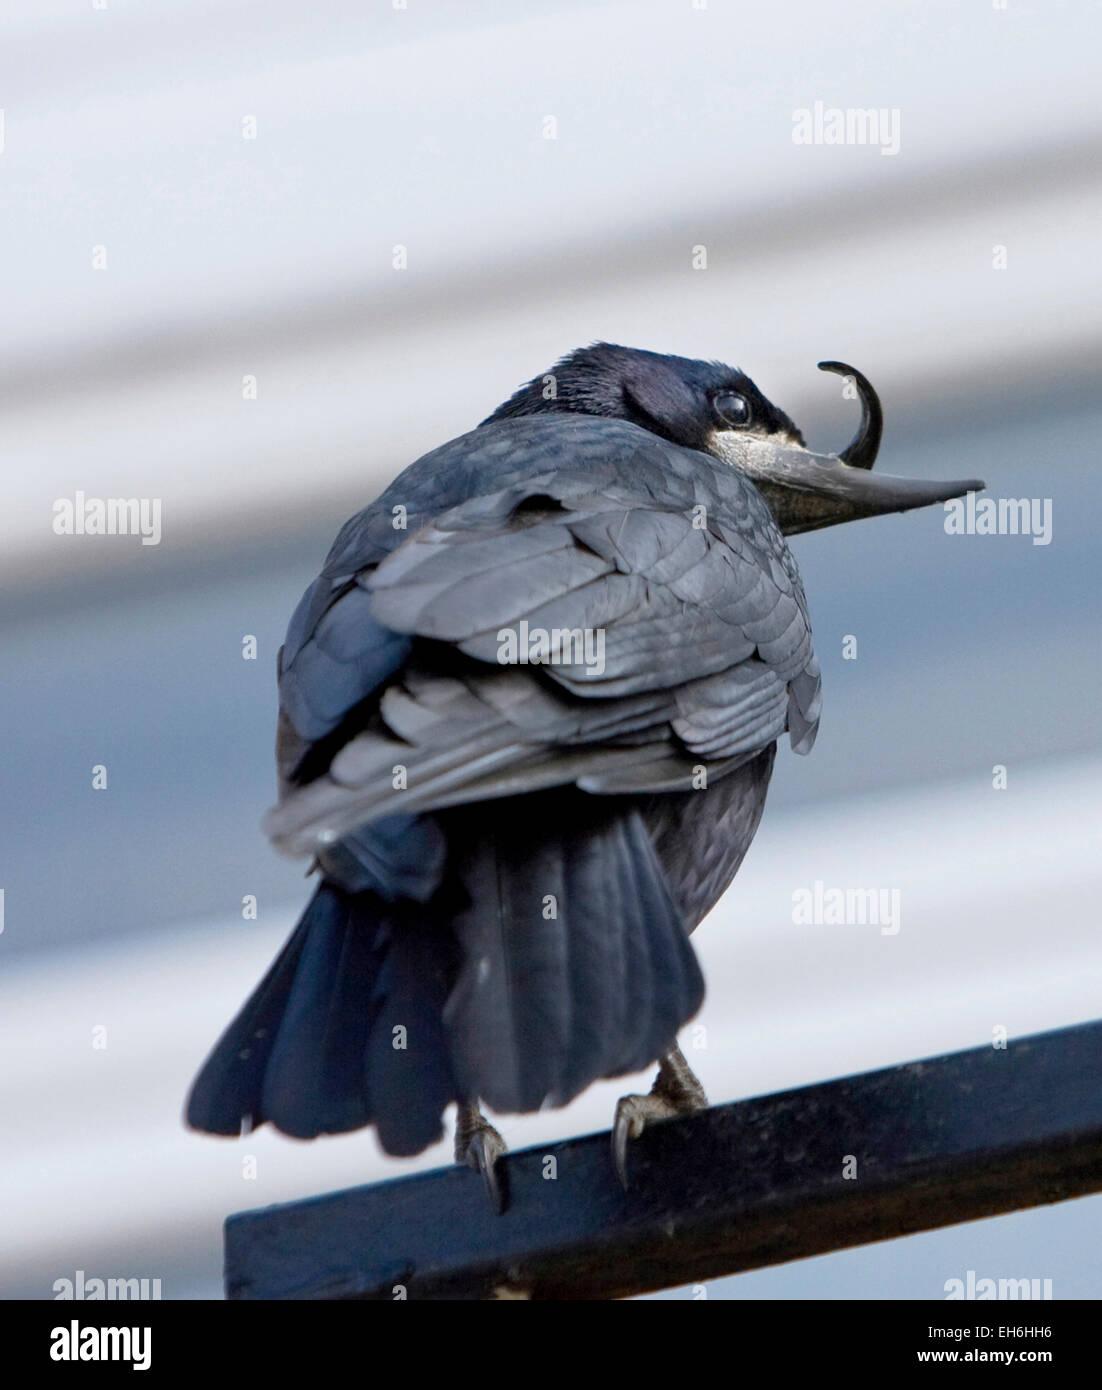 Rook with deformed beak Oxon - Stock Image